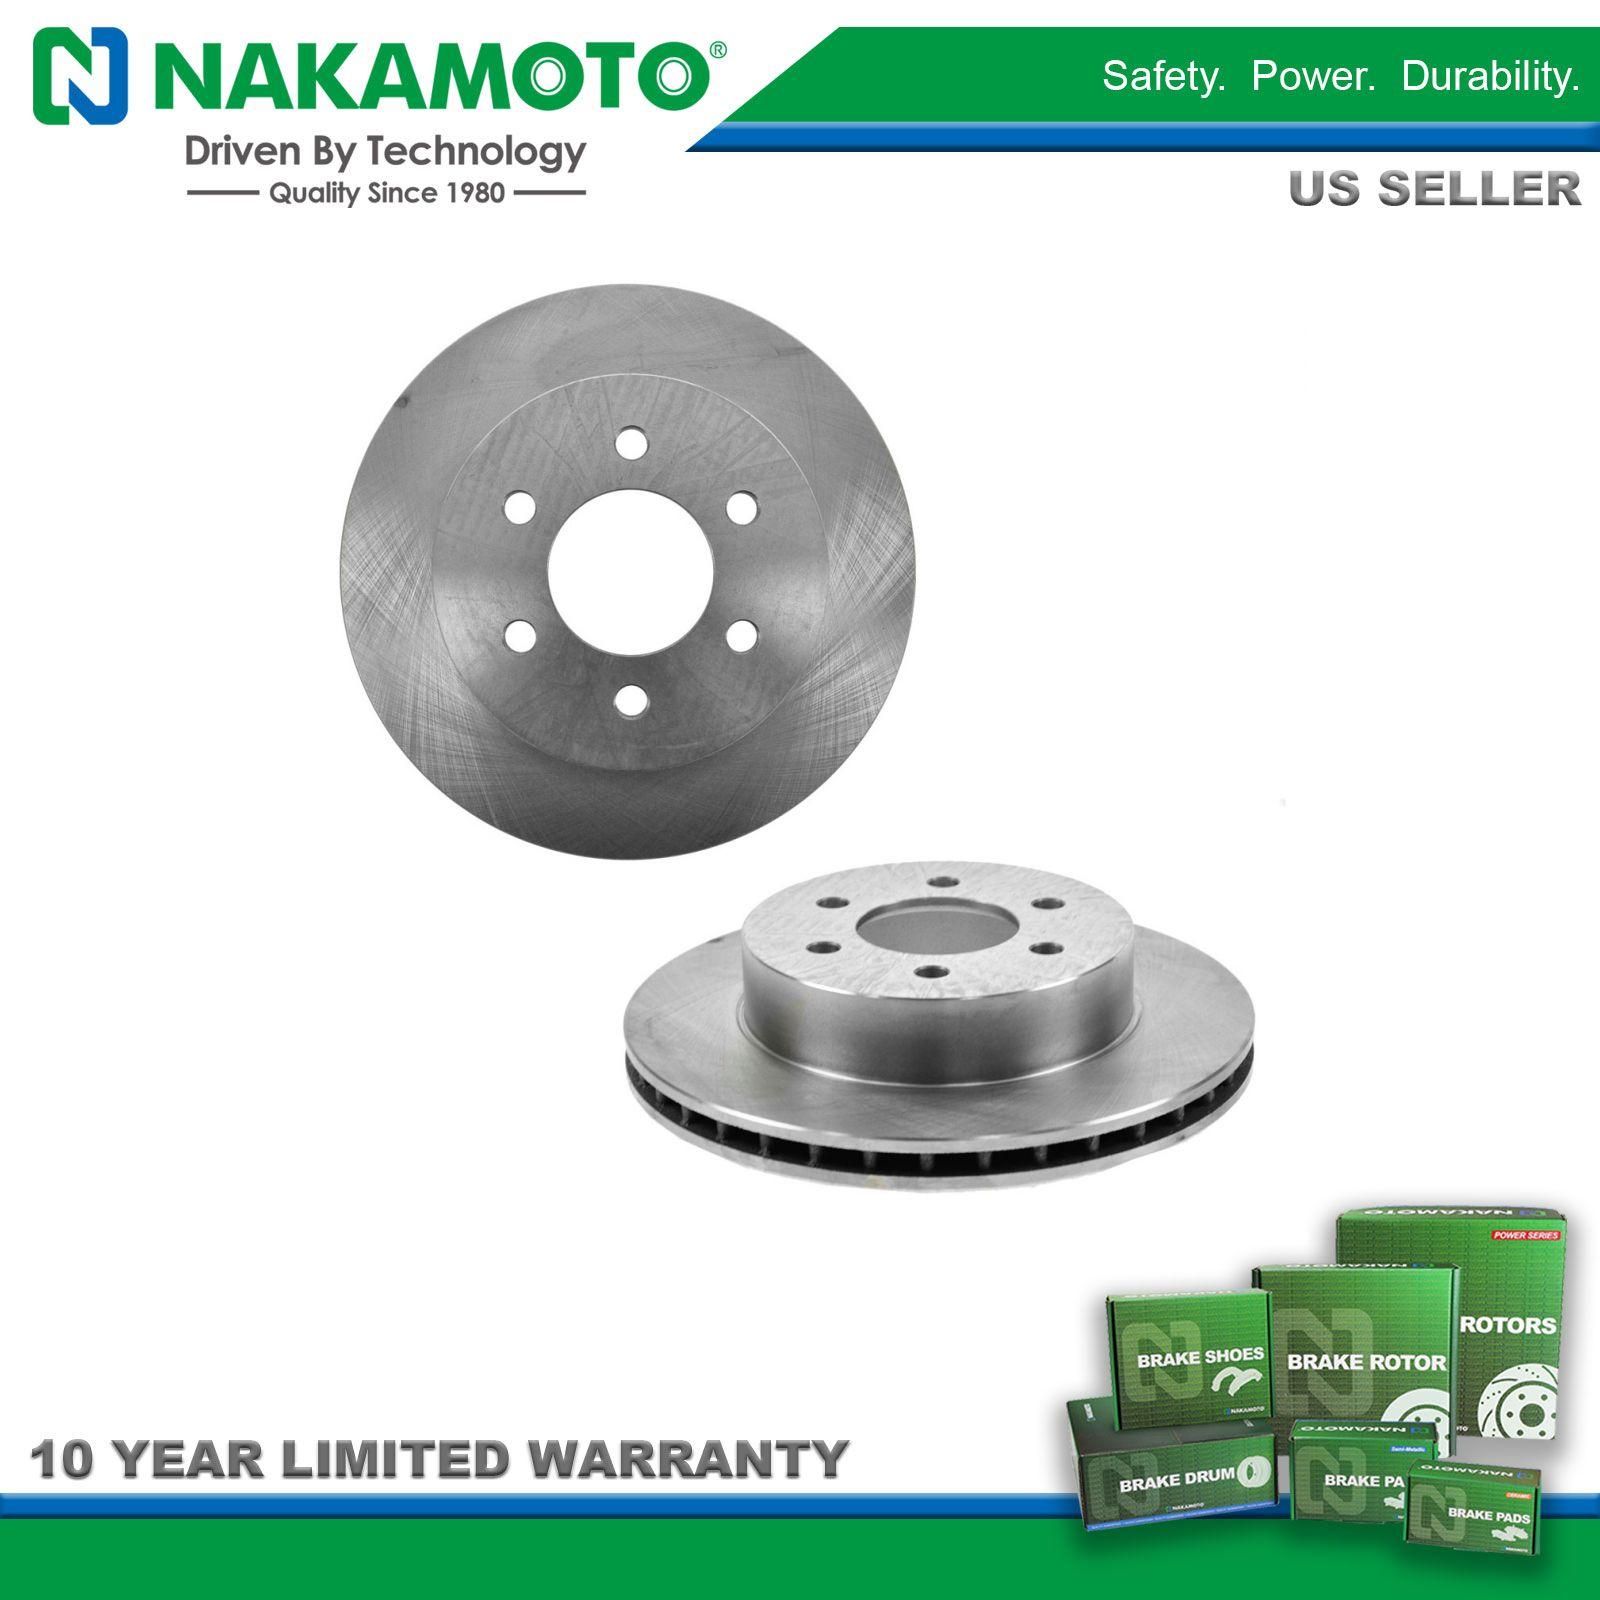 Suzuki OEM NOS connecting rod 12161-12002 RM100 RM125 TS100 TS125  #3052